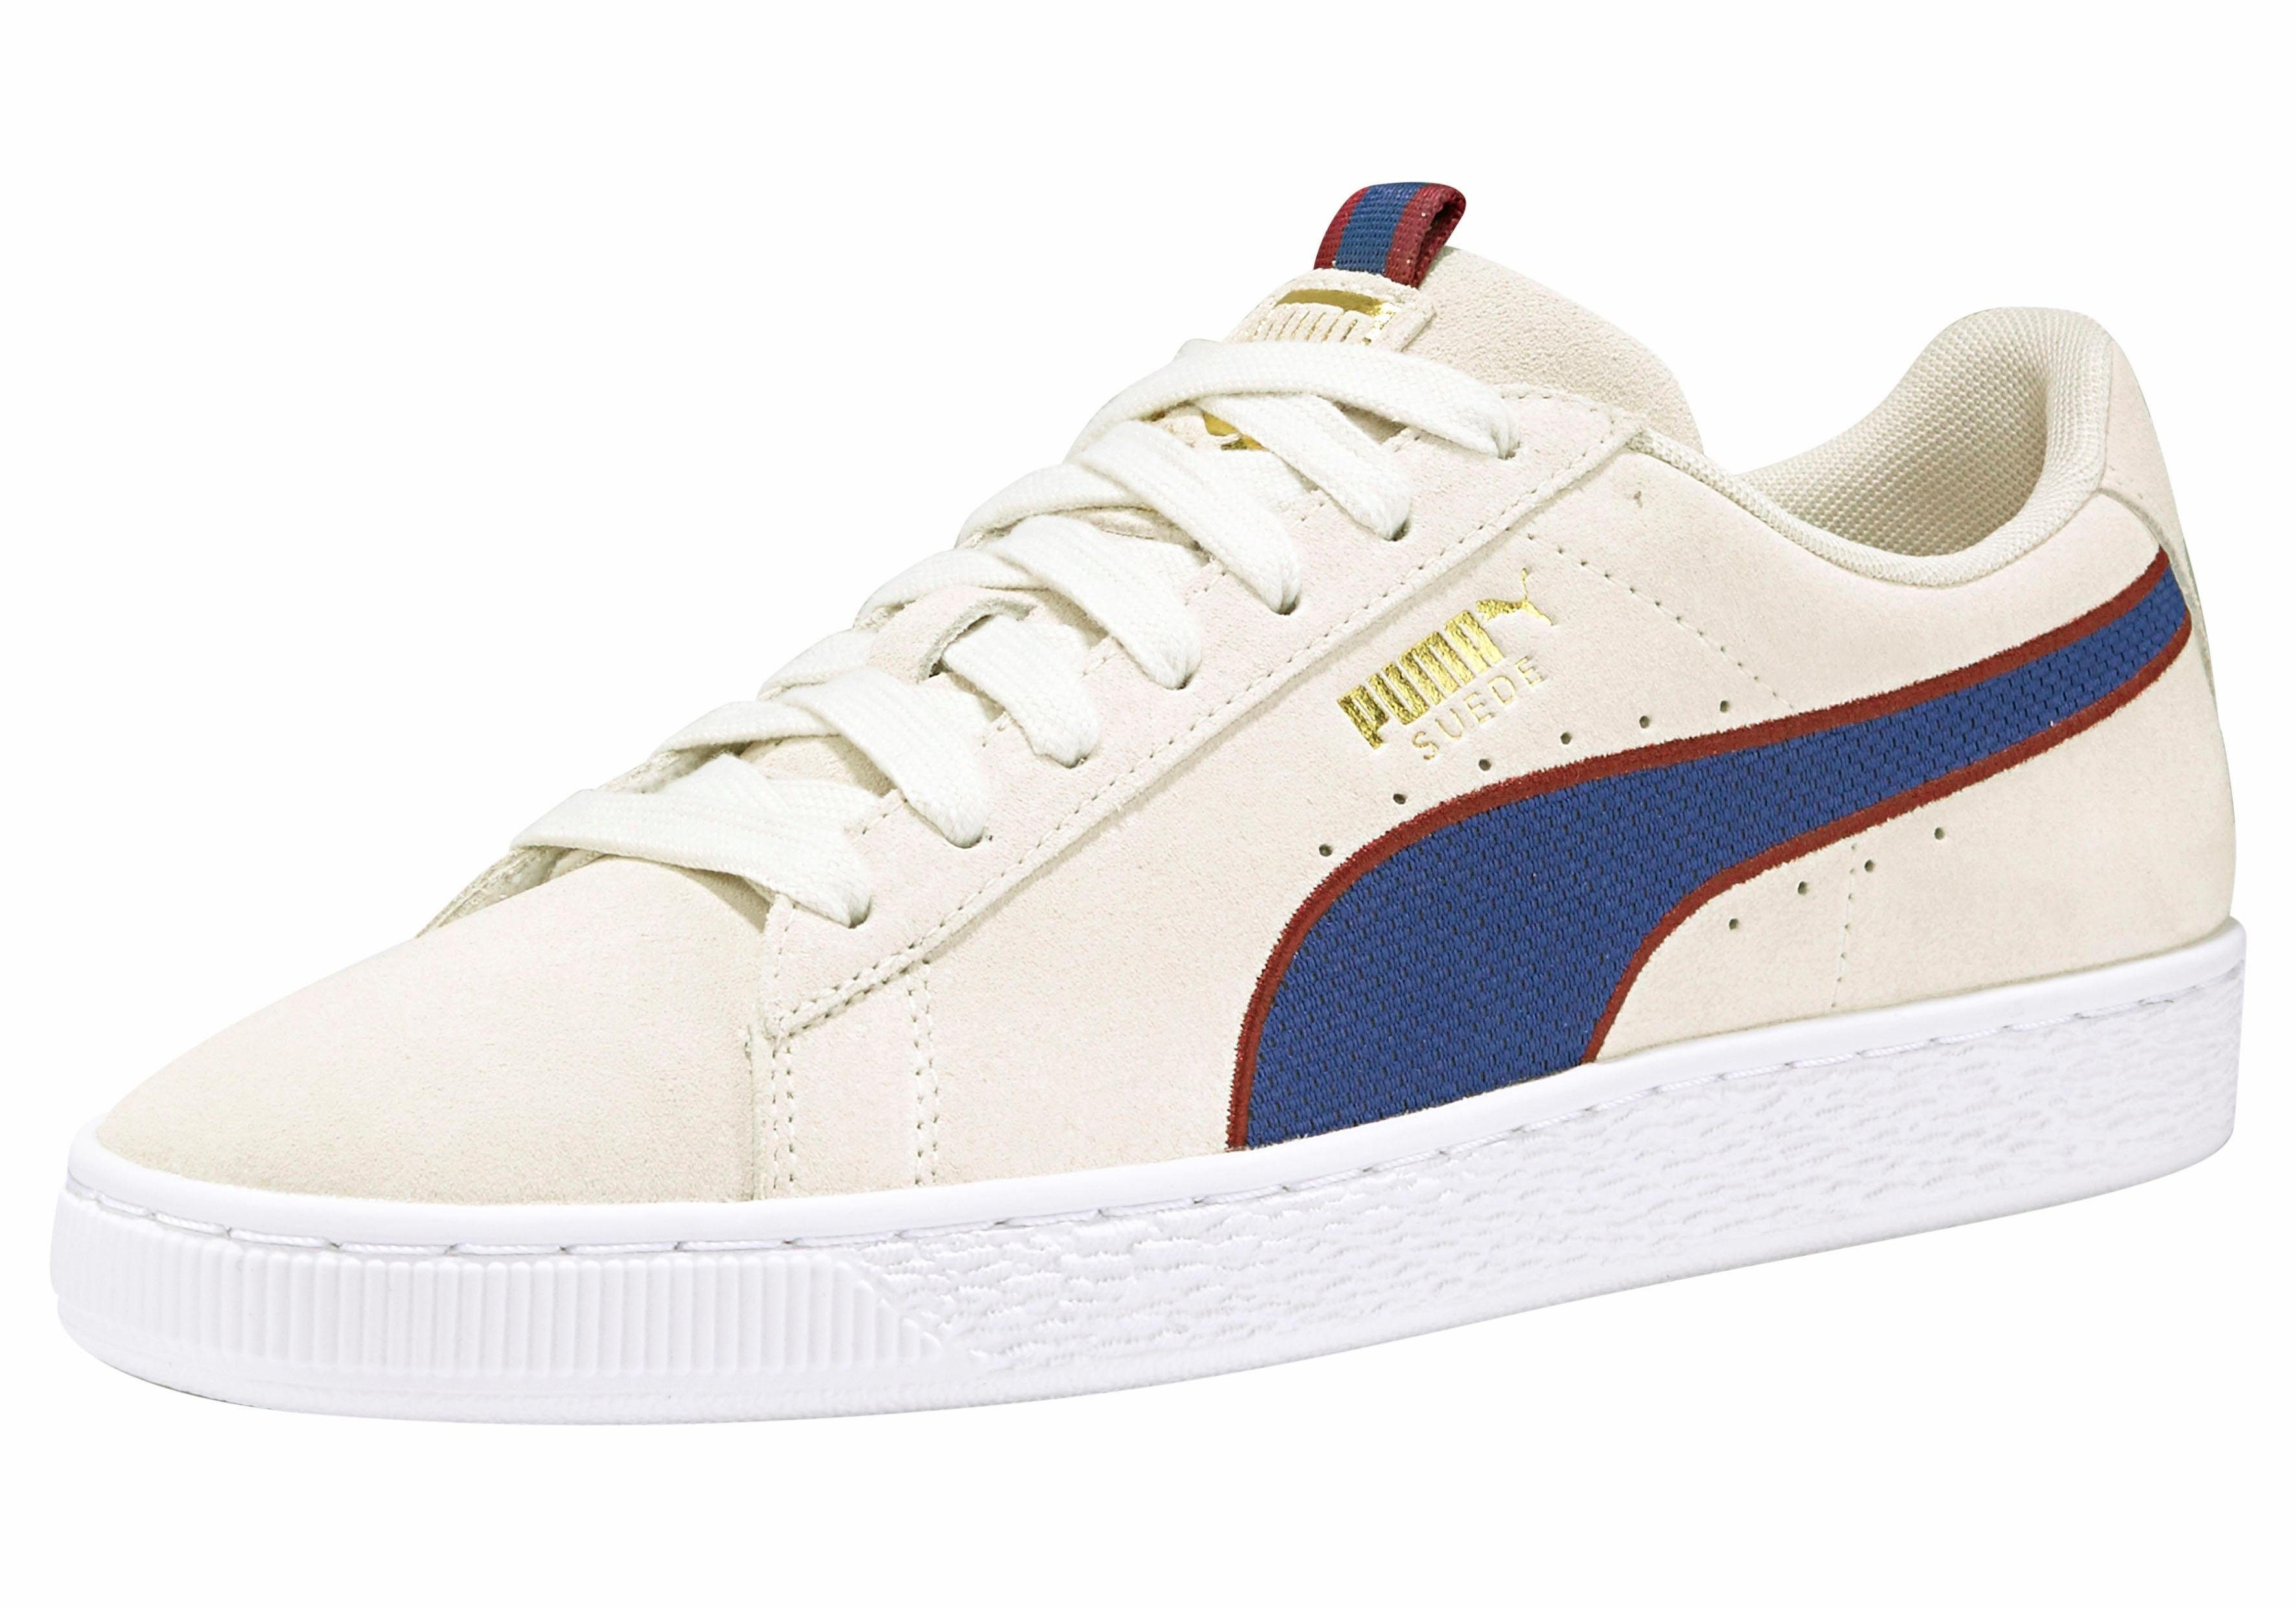 PUMA Suede Classic Sport Sneaker online kaufen  offwhite-blau